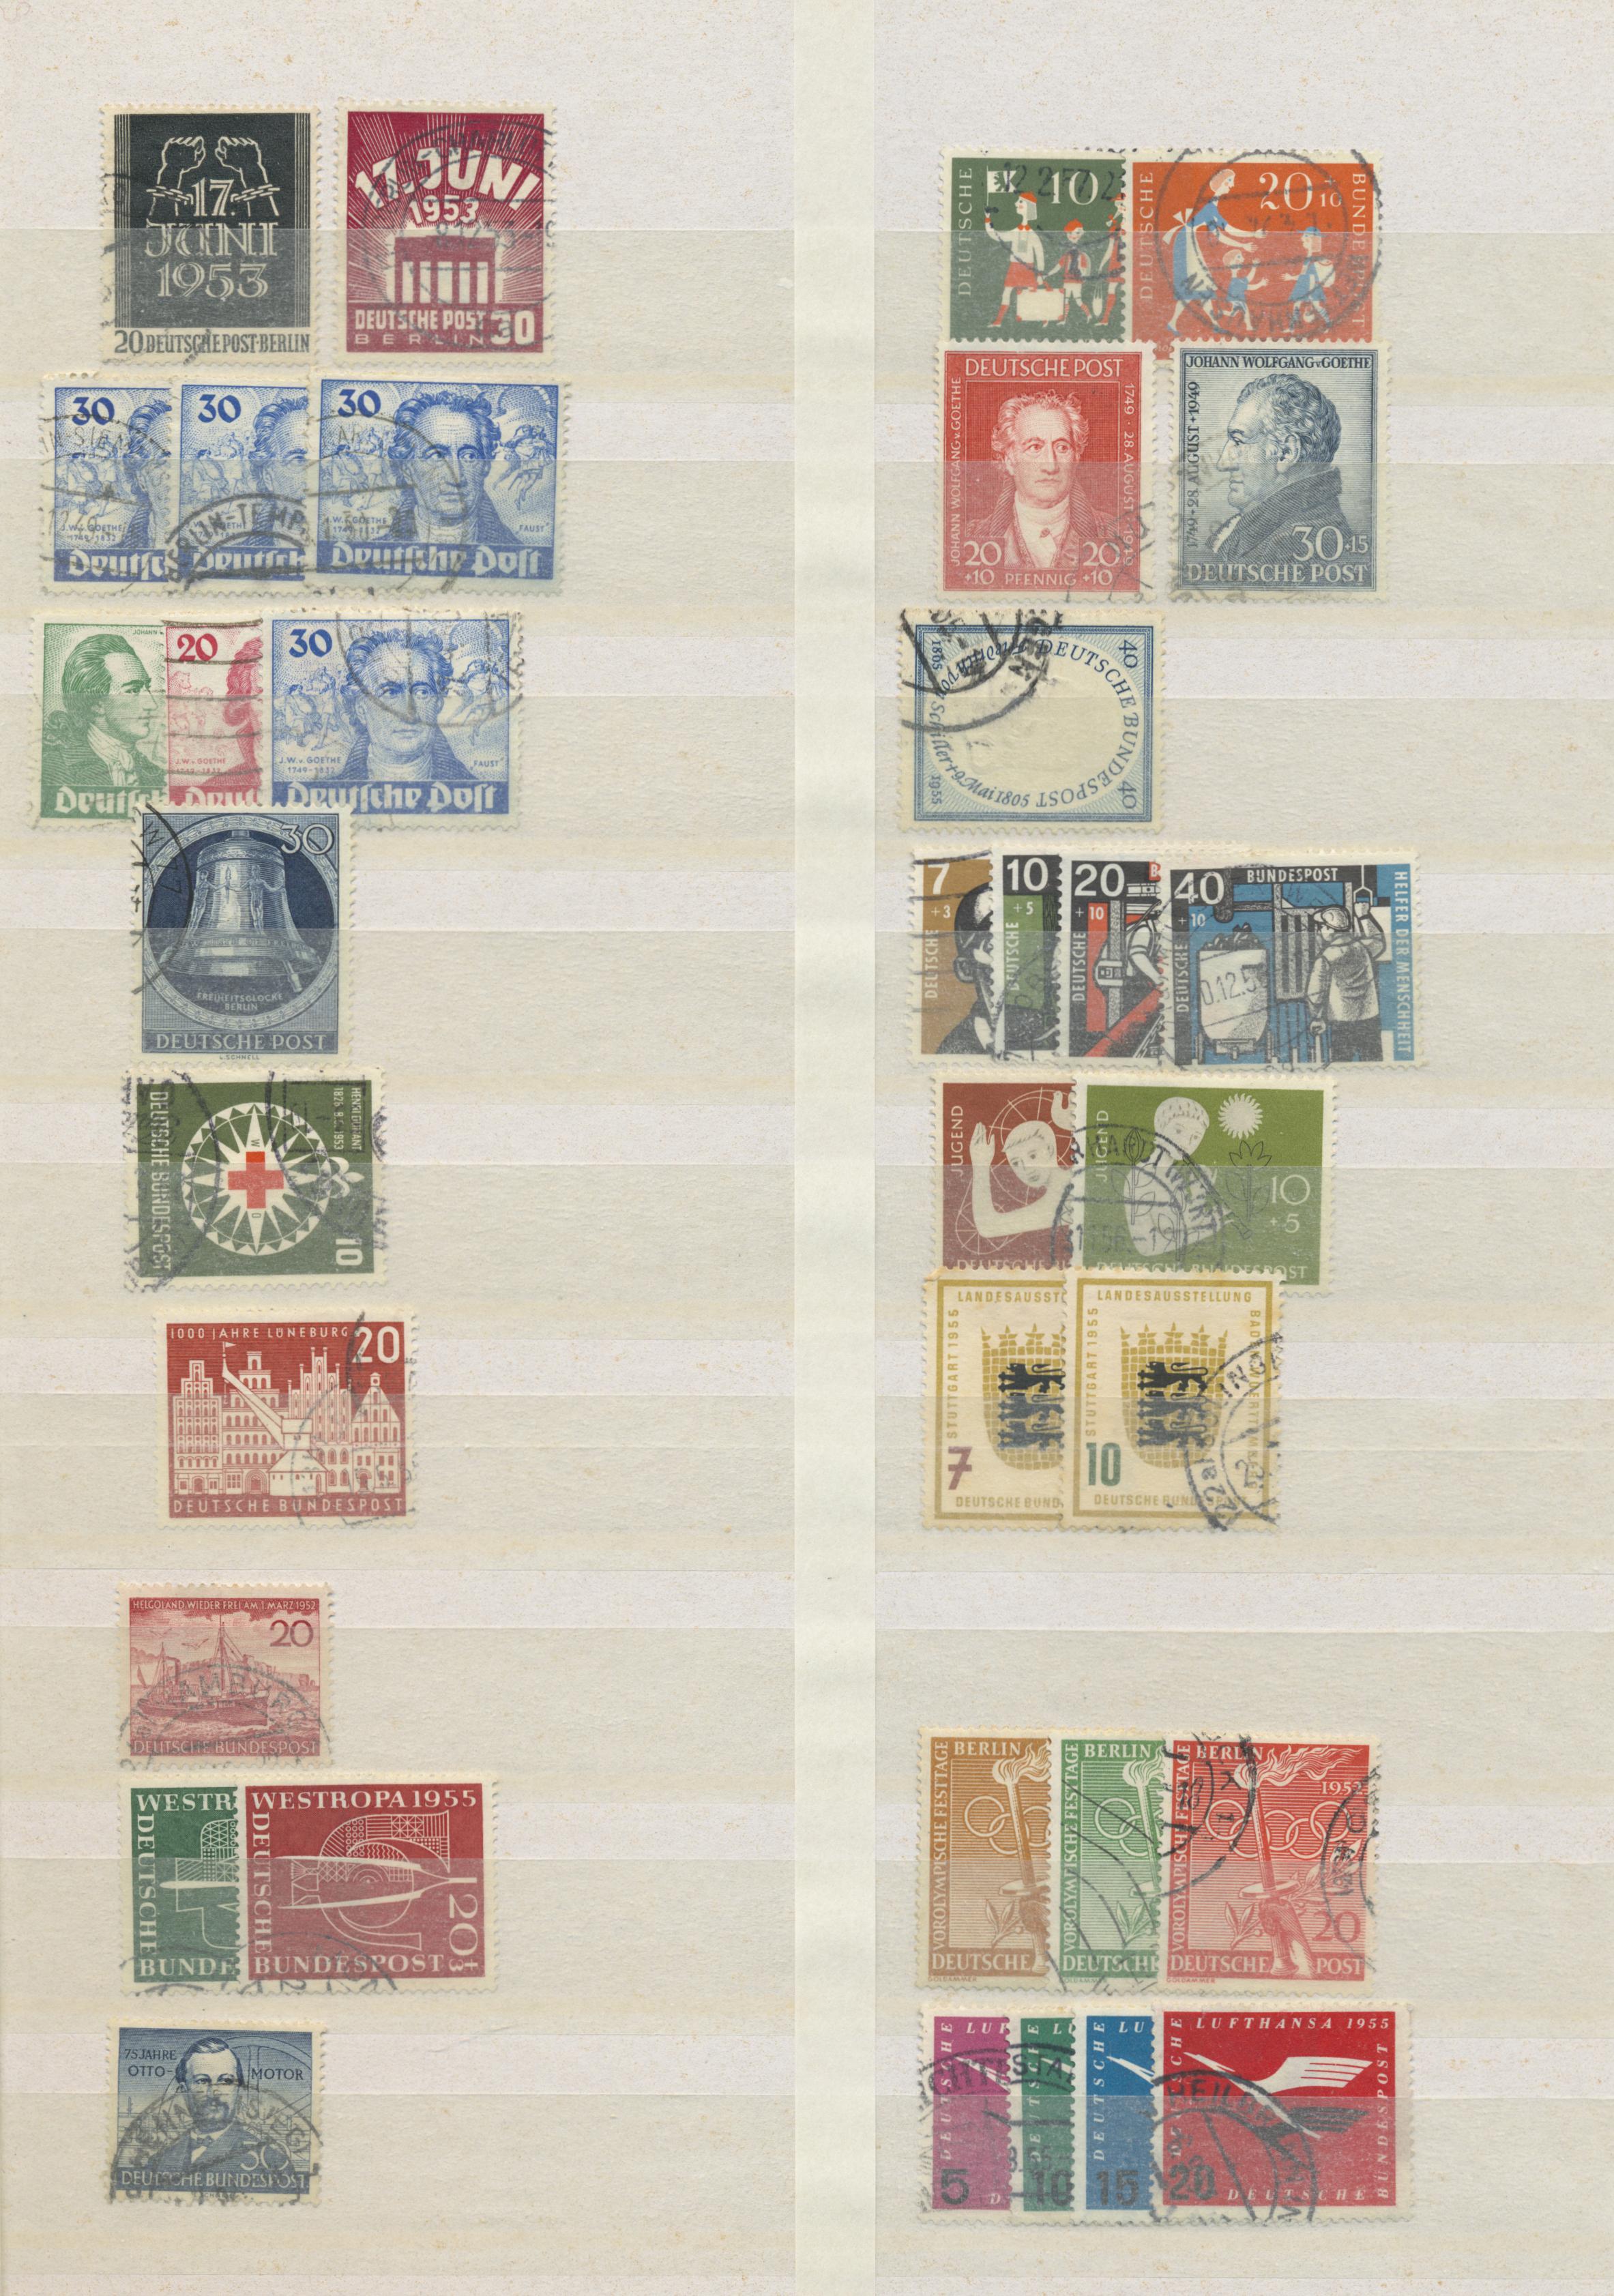 Lot 38091 - bundesrepublik und berlin  -  Auktionshaus Christoph Gärtner GmbH & Co. KG Collections Germany,  Collections Supplement, Surprise boxes #39 Day 7